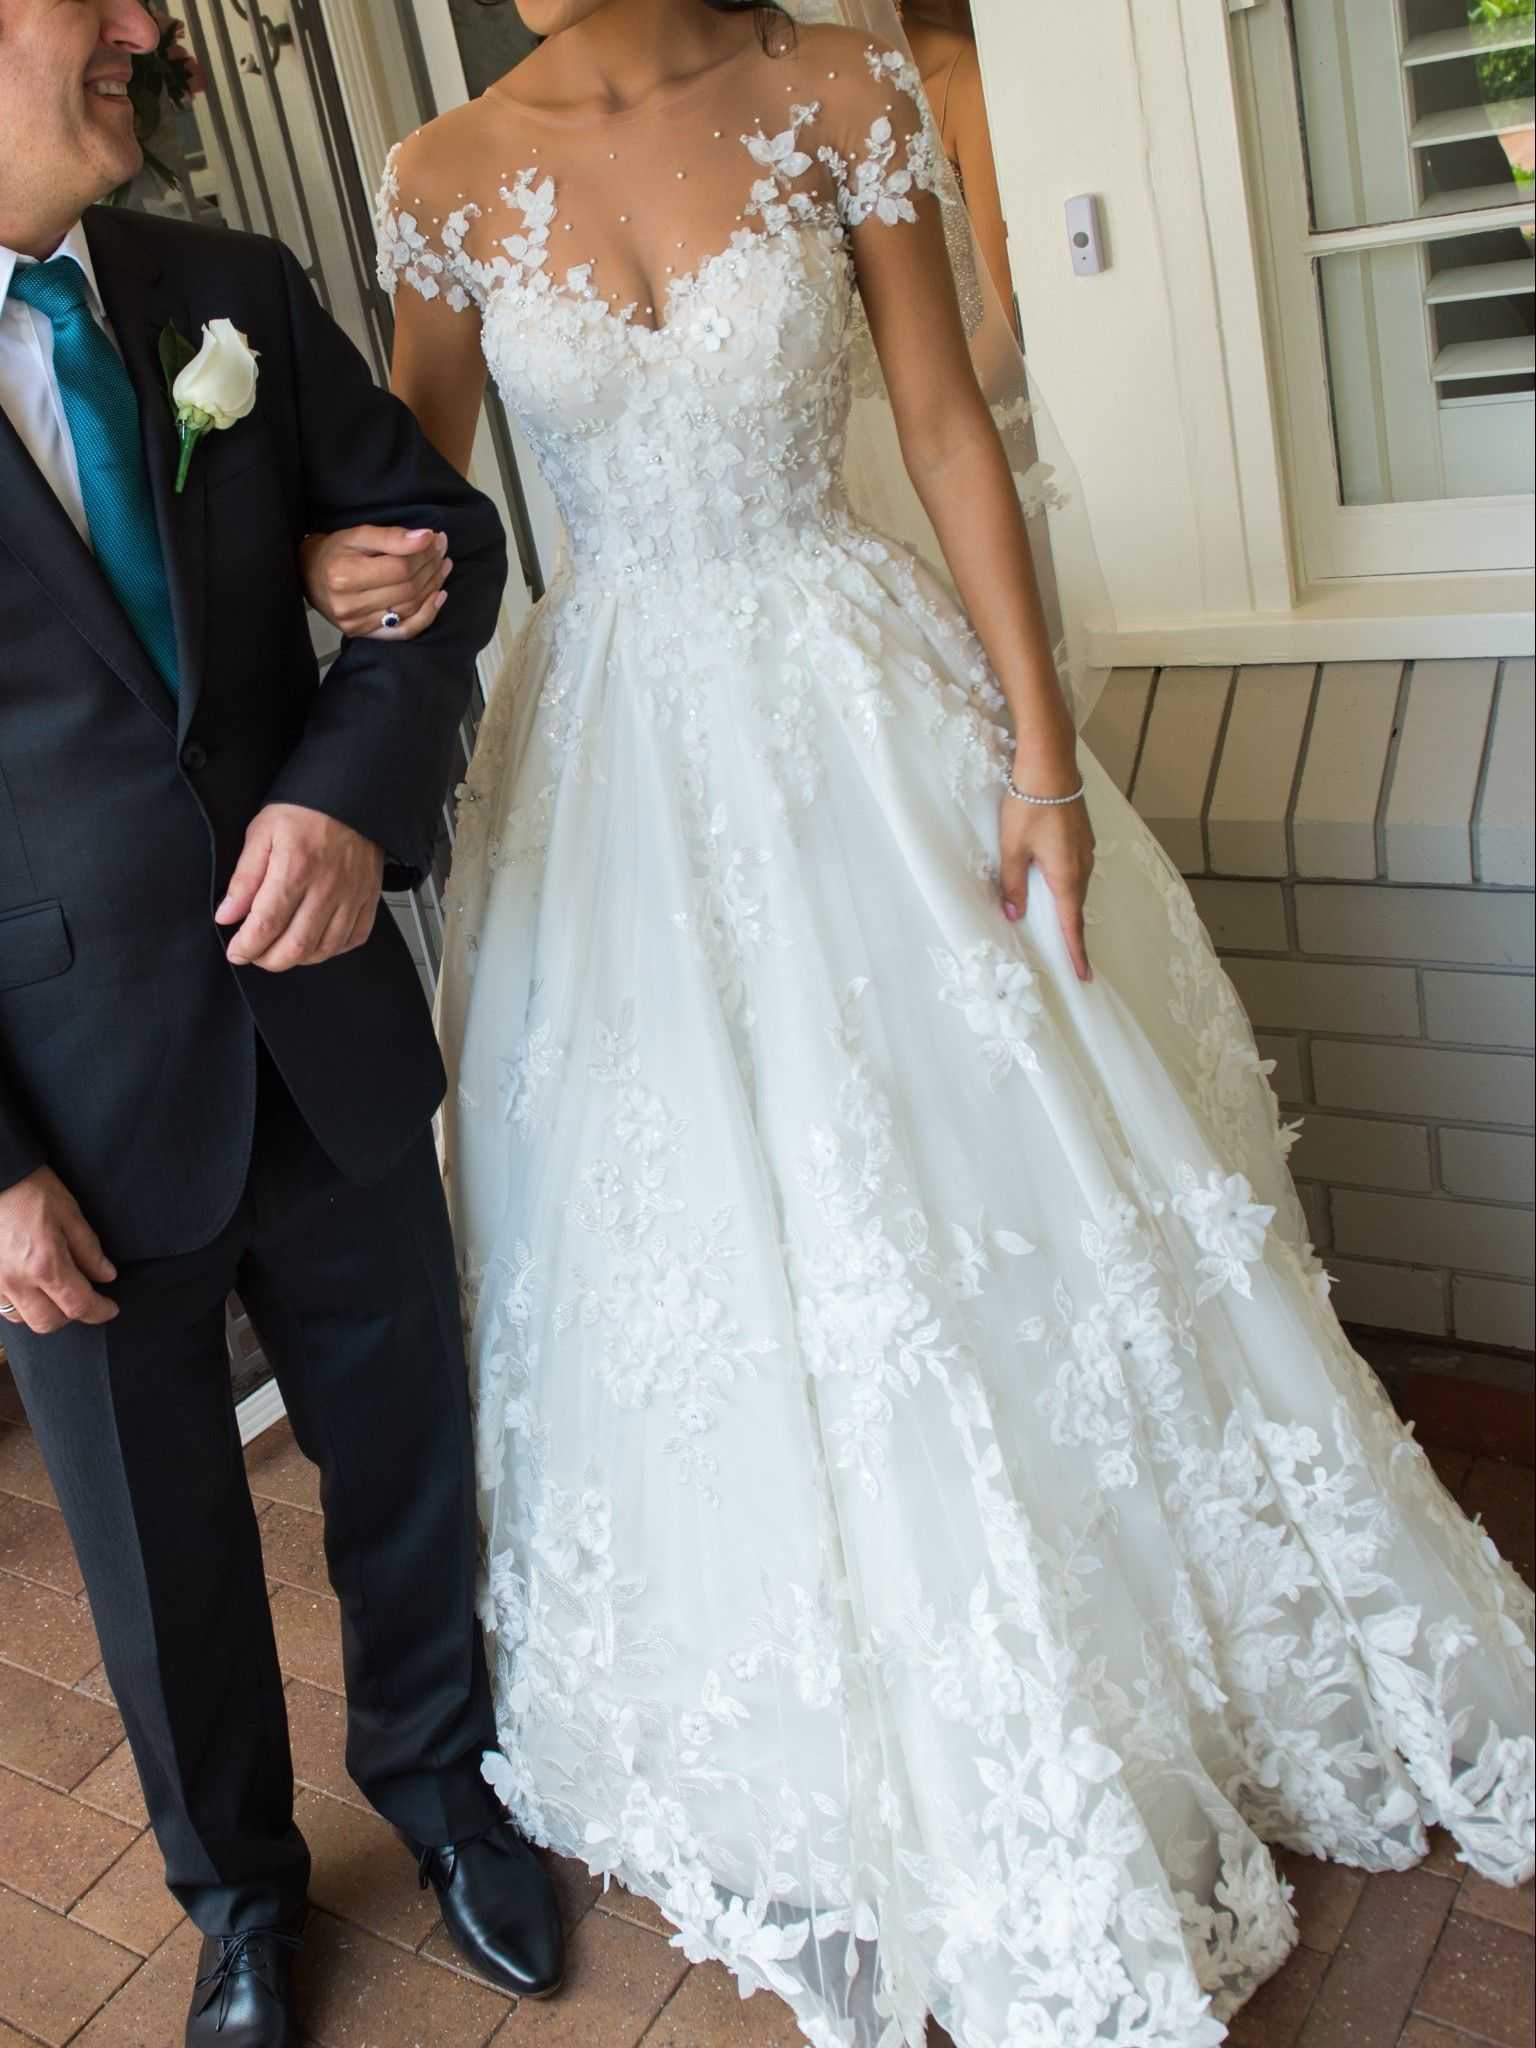 Steven khalil custom made wedding dress on sale off put a ring